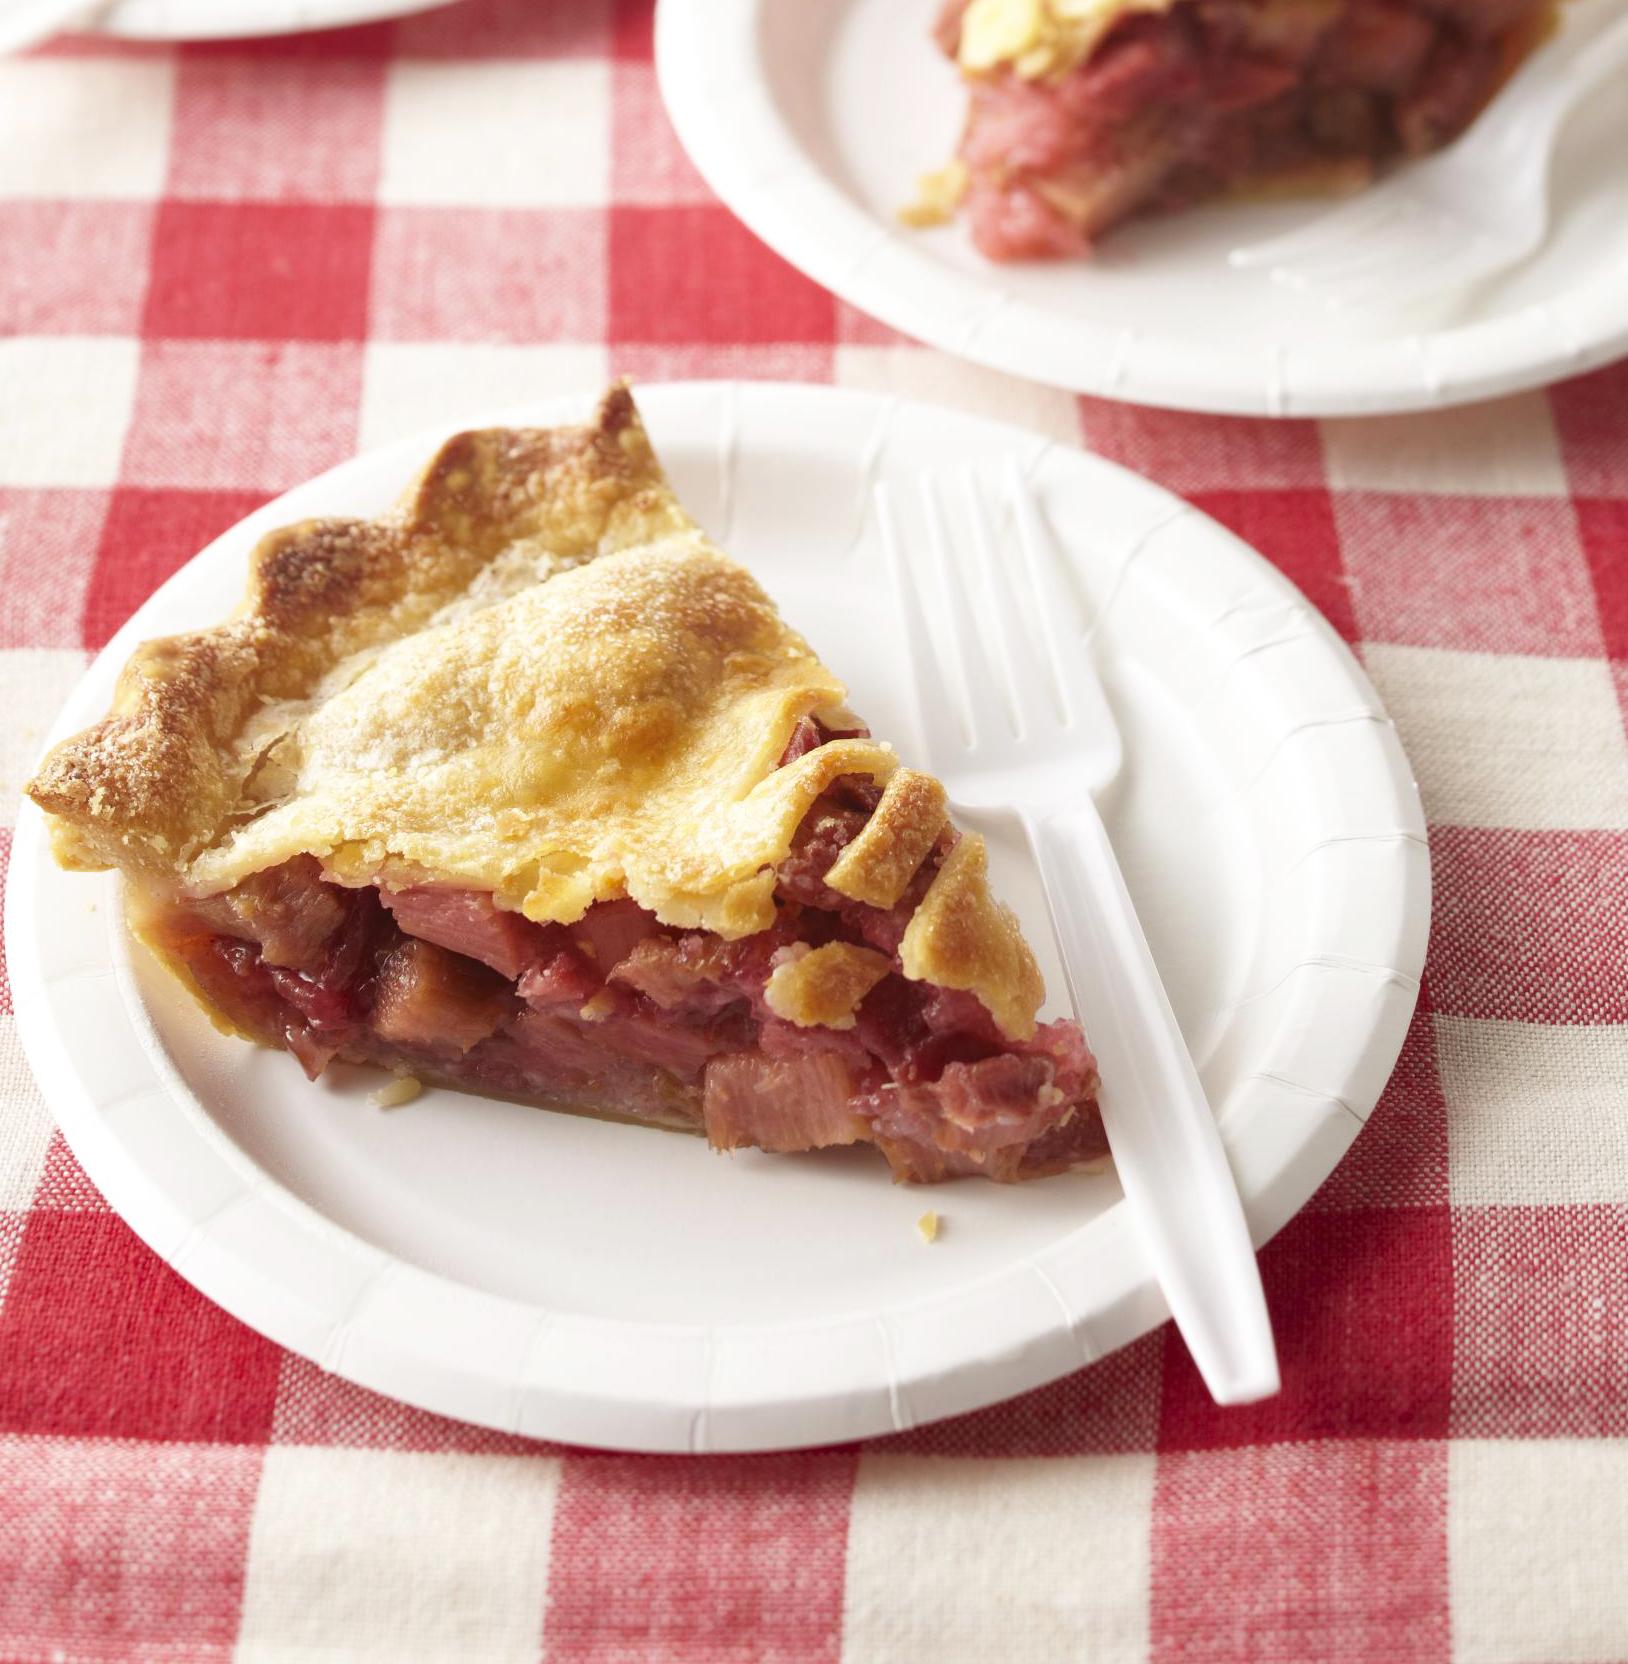 RAGBRAI rhubarb pie.